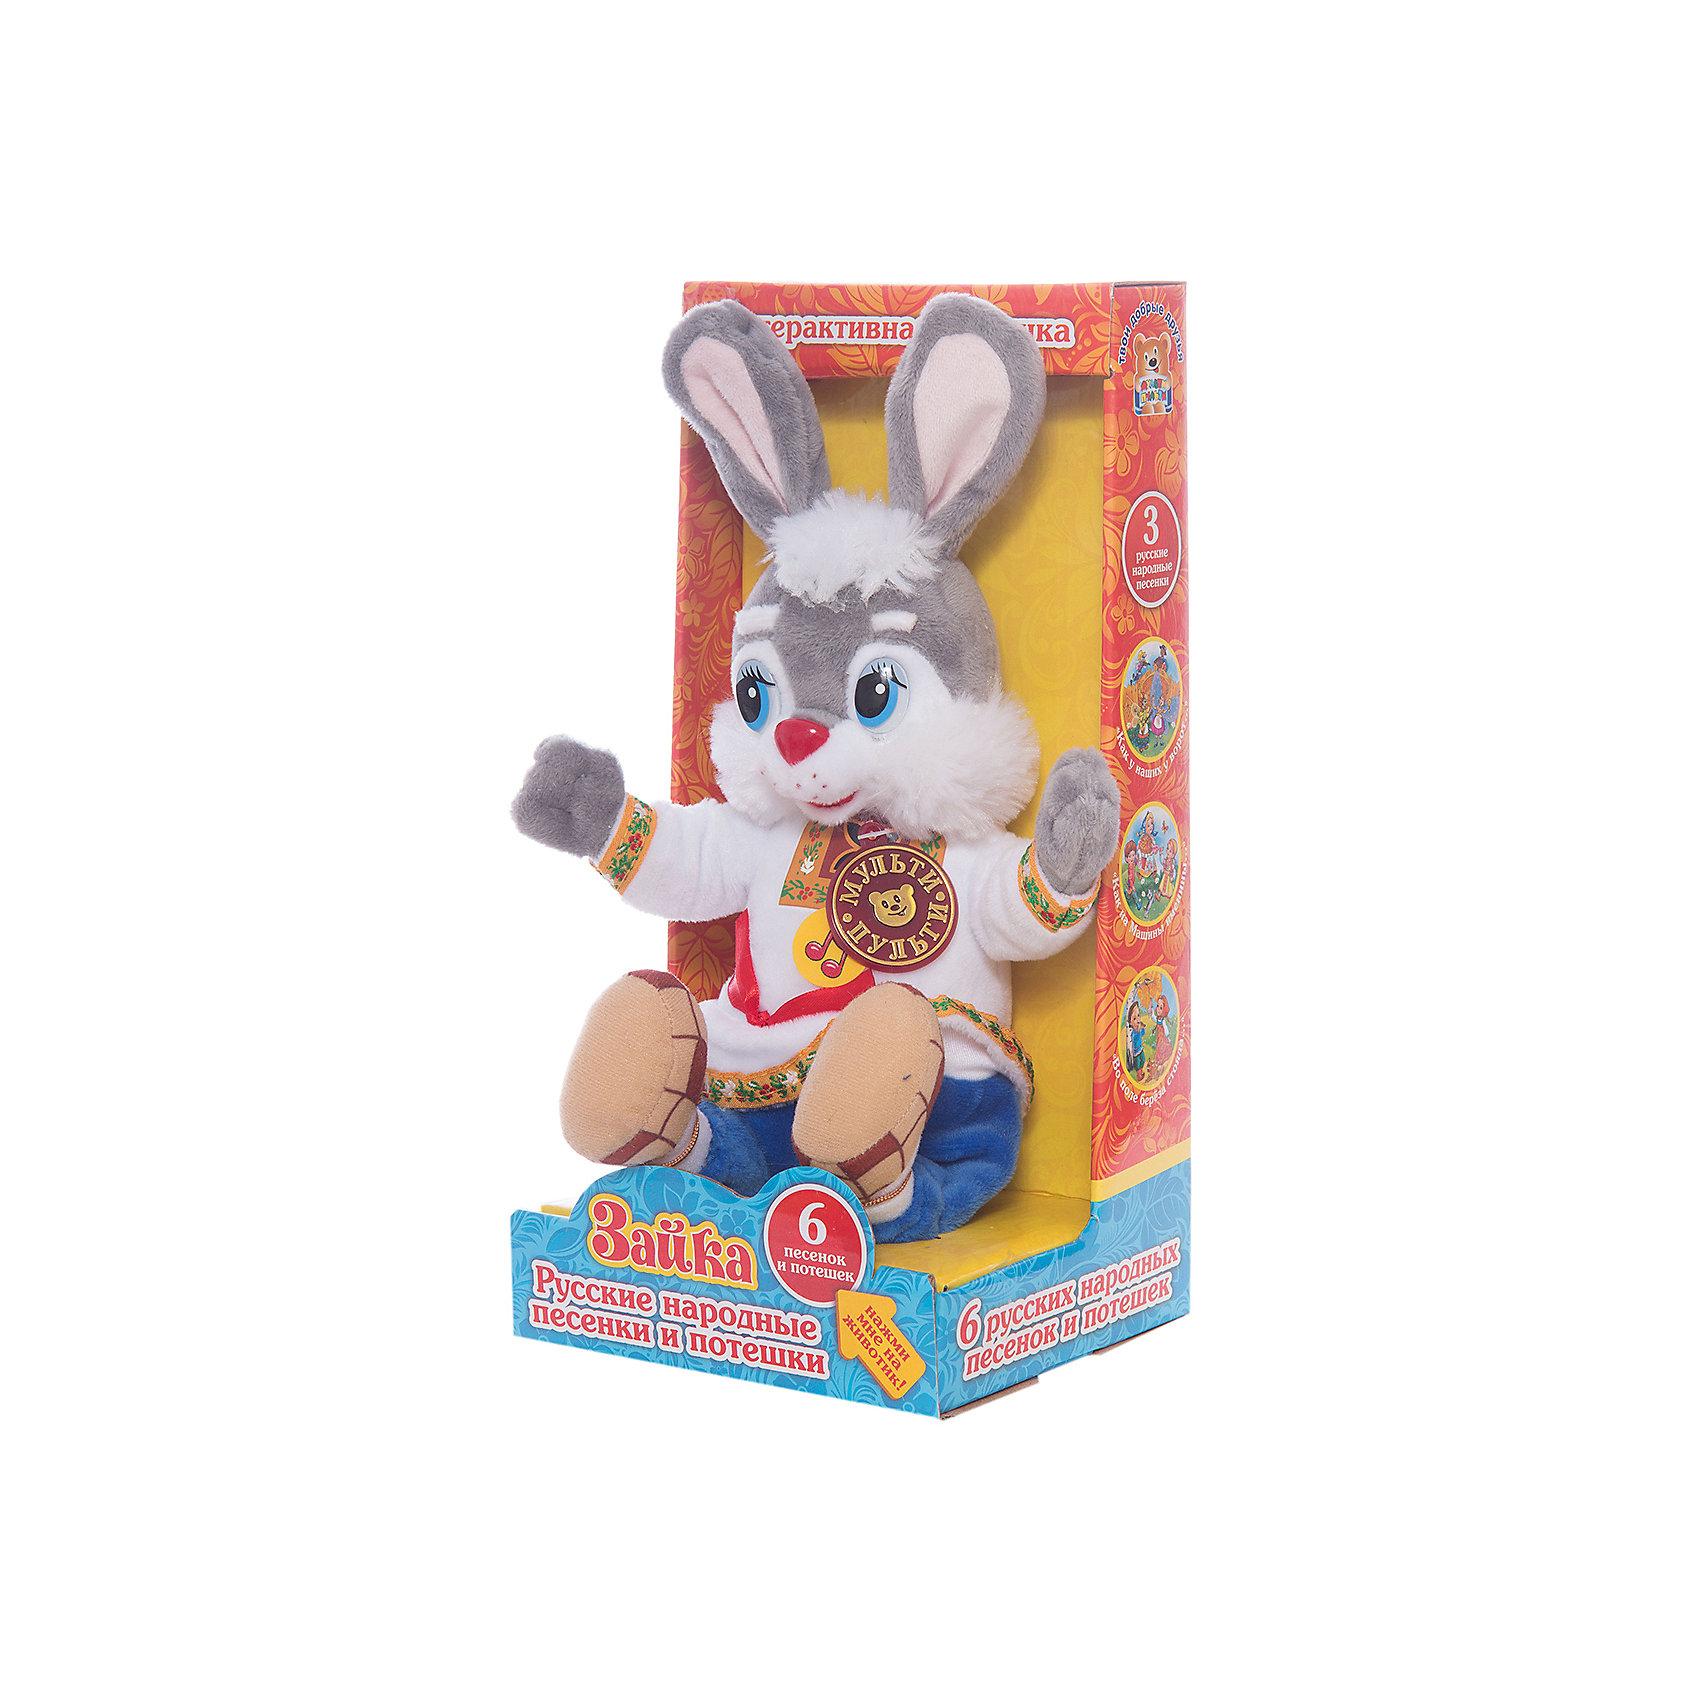 МУЛЬТИ-ПУЛЬТИ Мягкая игрушка Заяц, со звуком, МУЛЬТИ-ПУЛЬТИ мульти пульти коза дереза 23 см со звуком мульти пульти